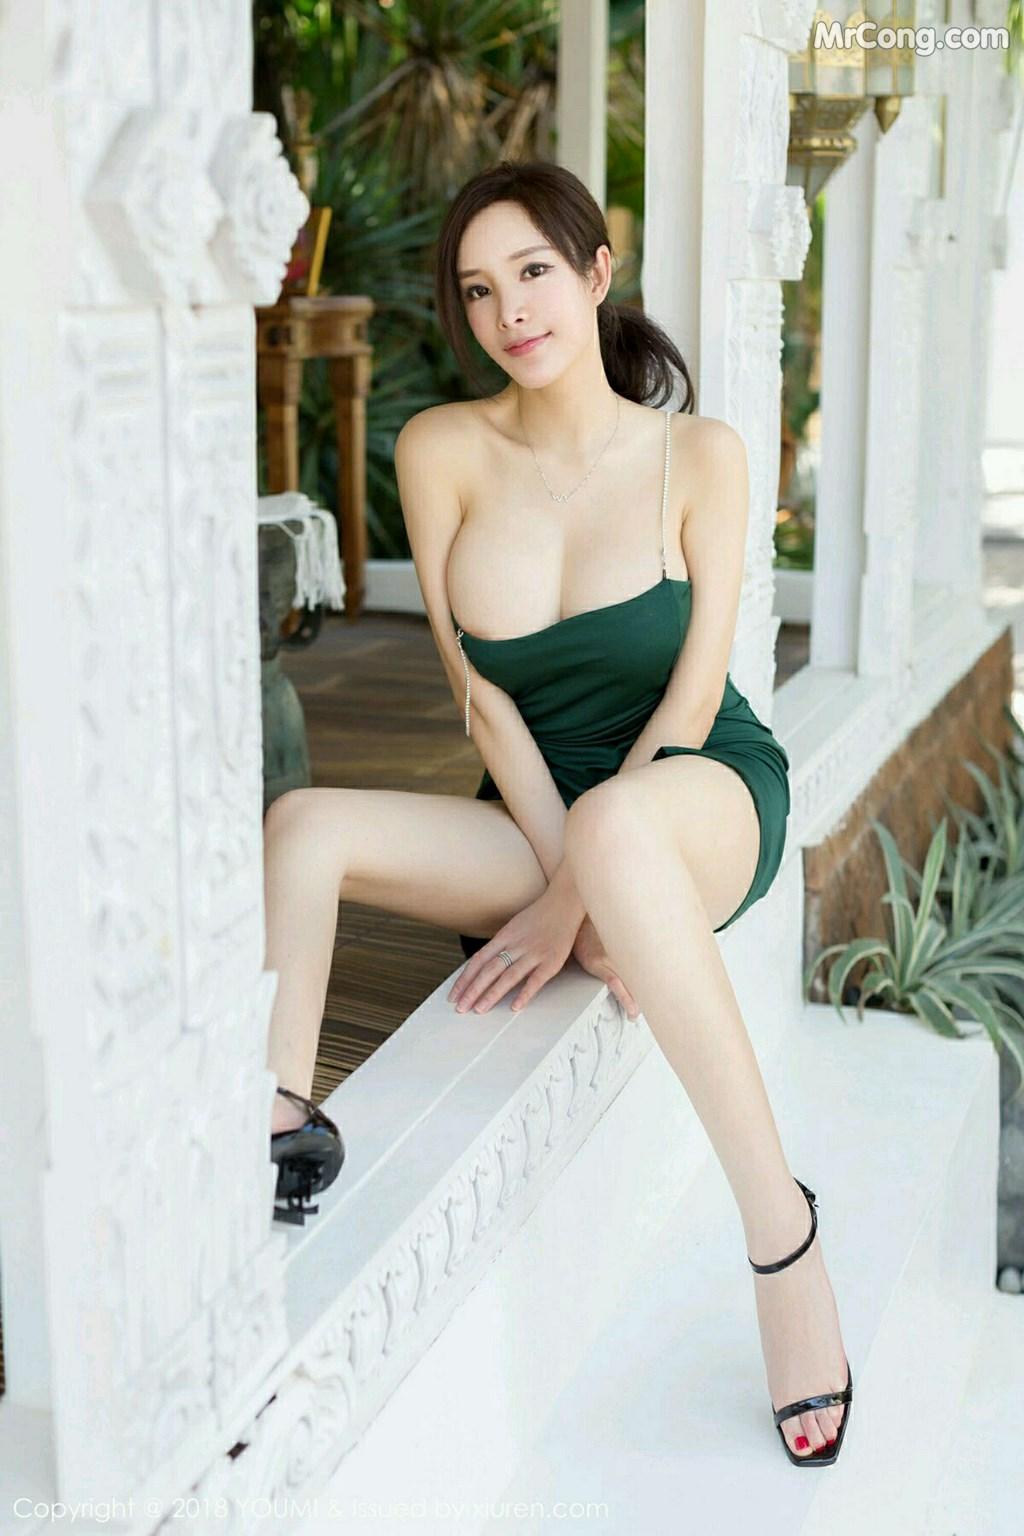 Image YouMi-Vol.188-Tu-Fei-Yuan-Ai-Cuo-Qiong-MrCong.com-015 in post YouMi Vol.188: Người mẫu 奶瓶土肥圆 (52 ảnh)